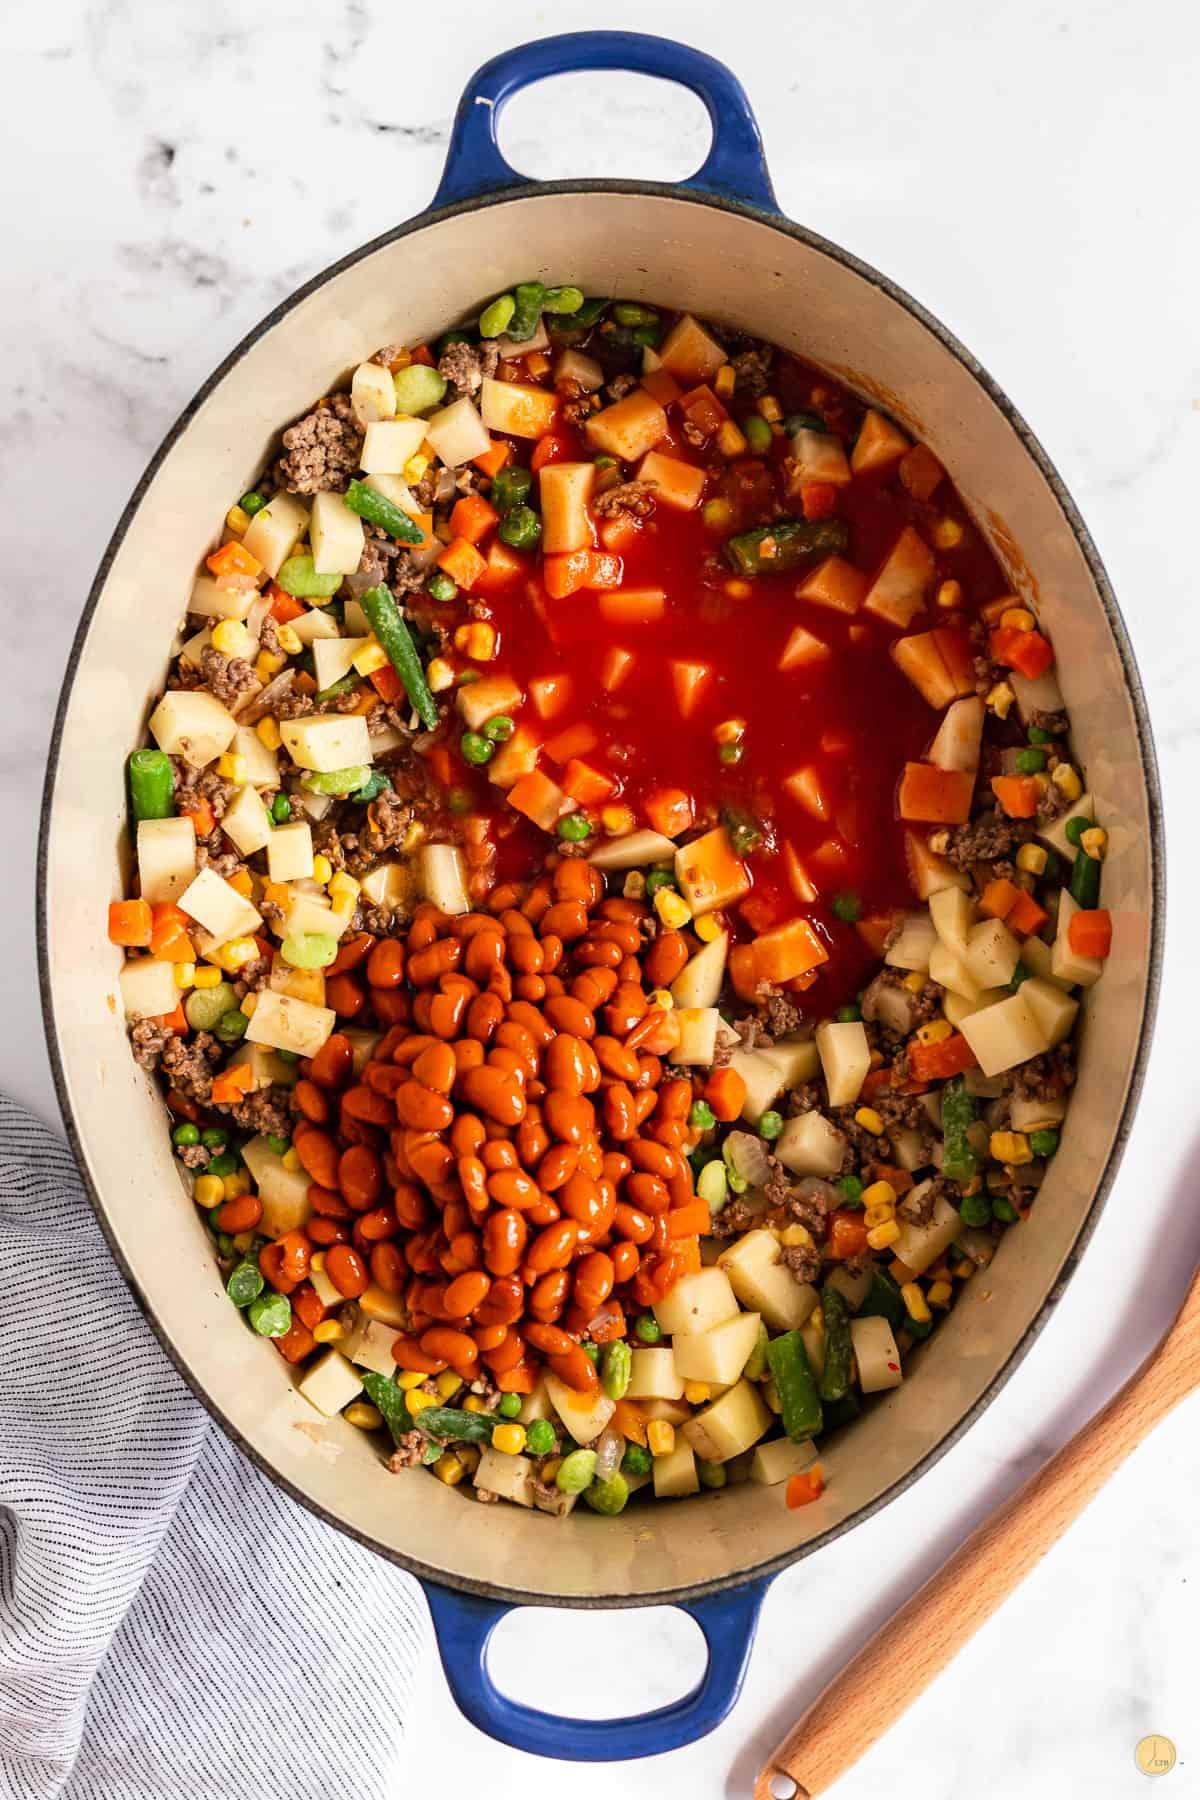 soup in a pot